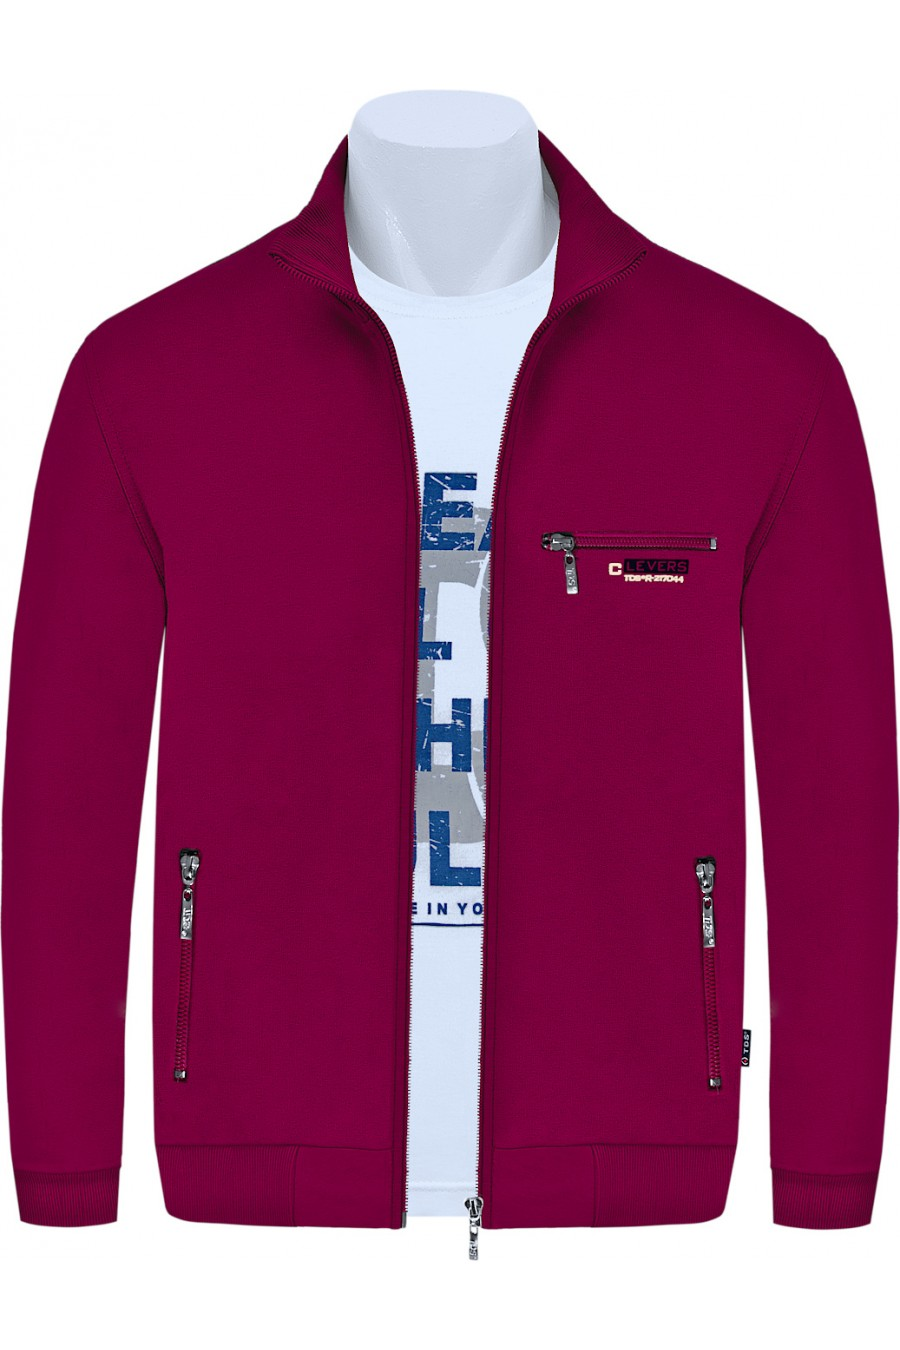 Bluza sportowa TSZG CLASSIC bordo